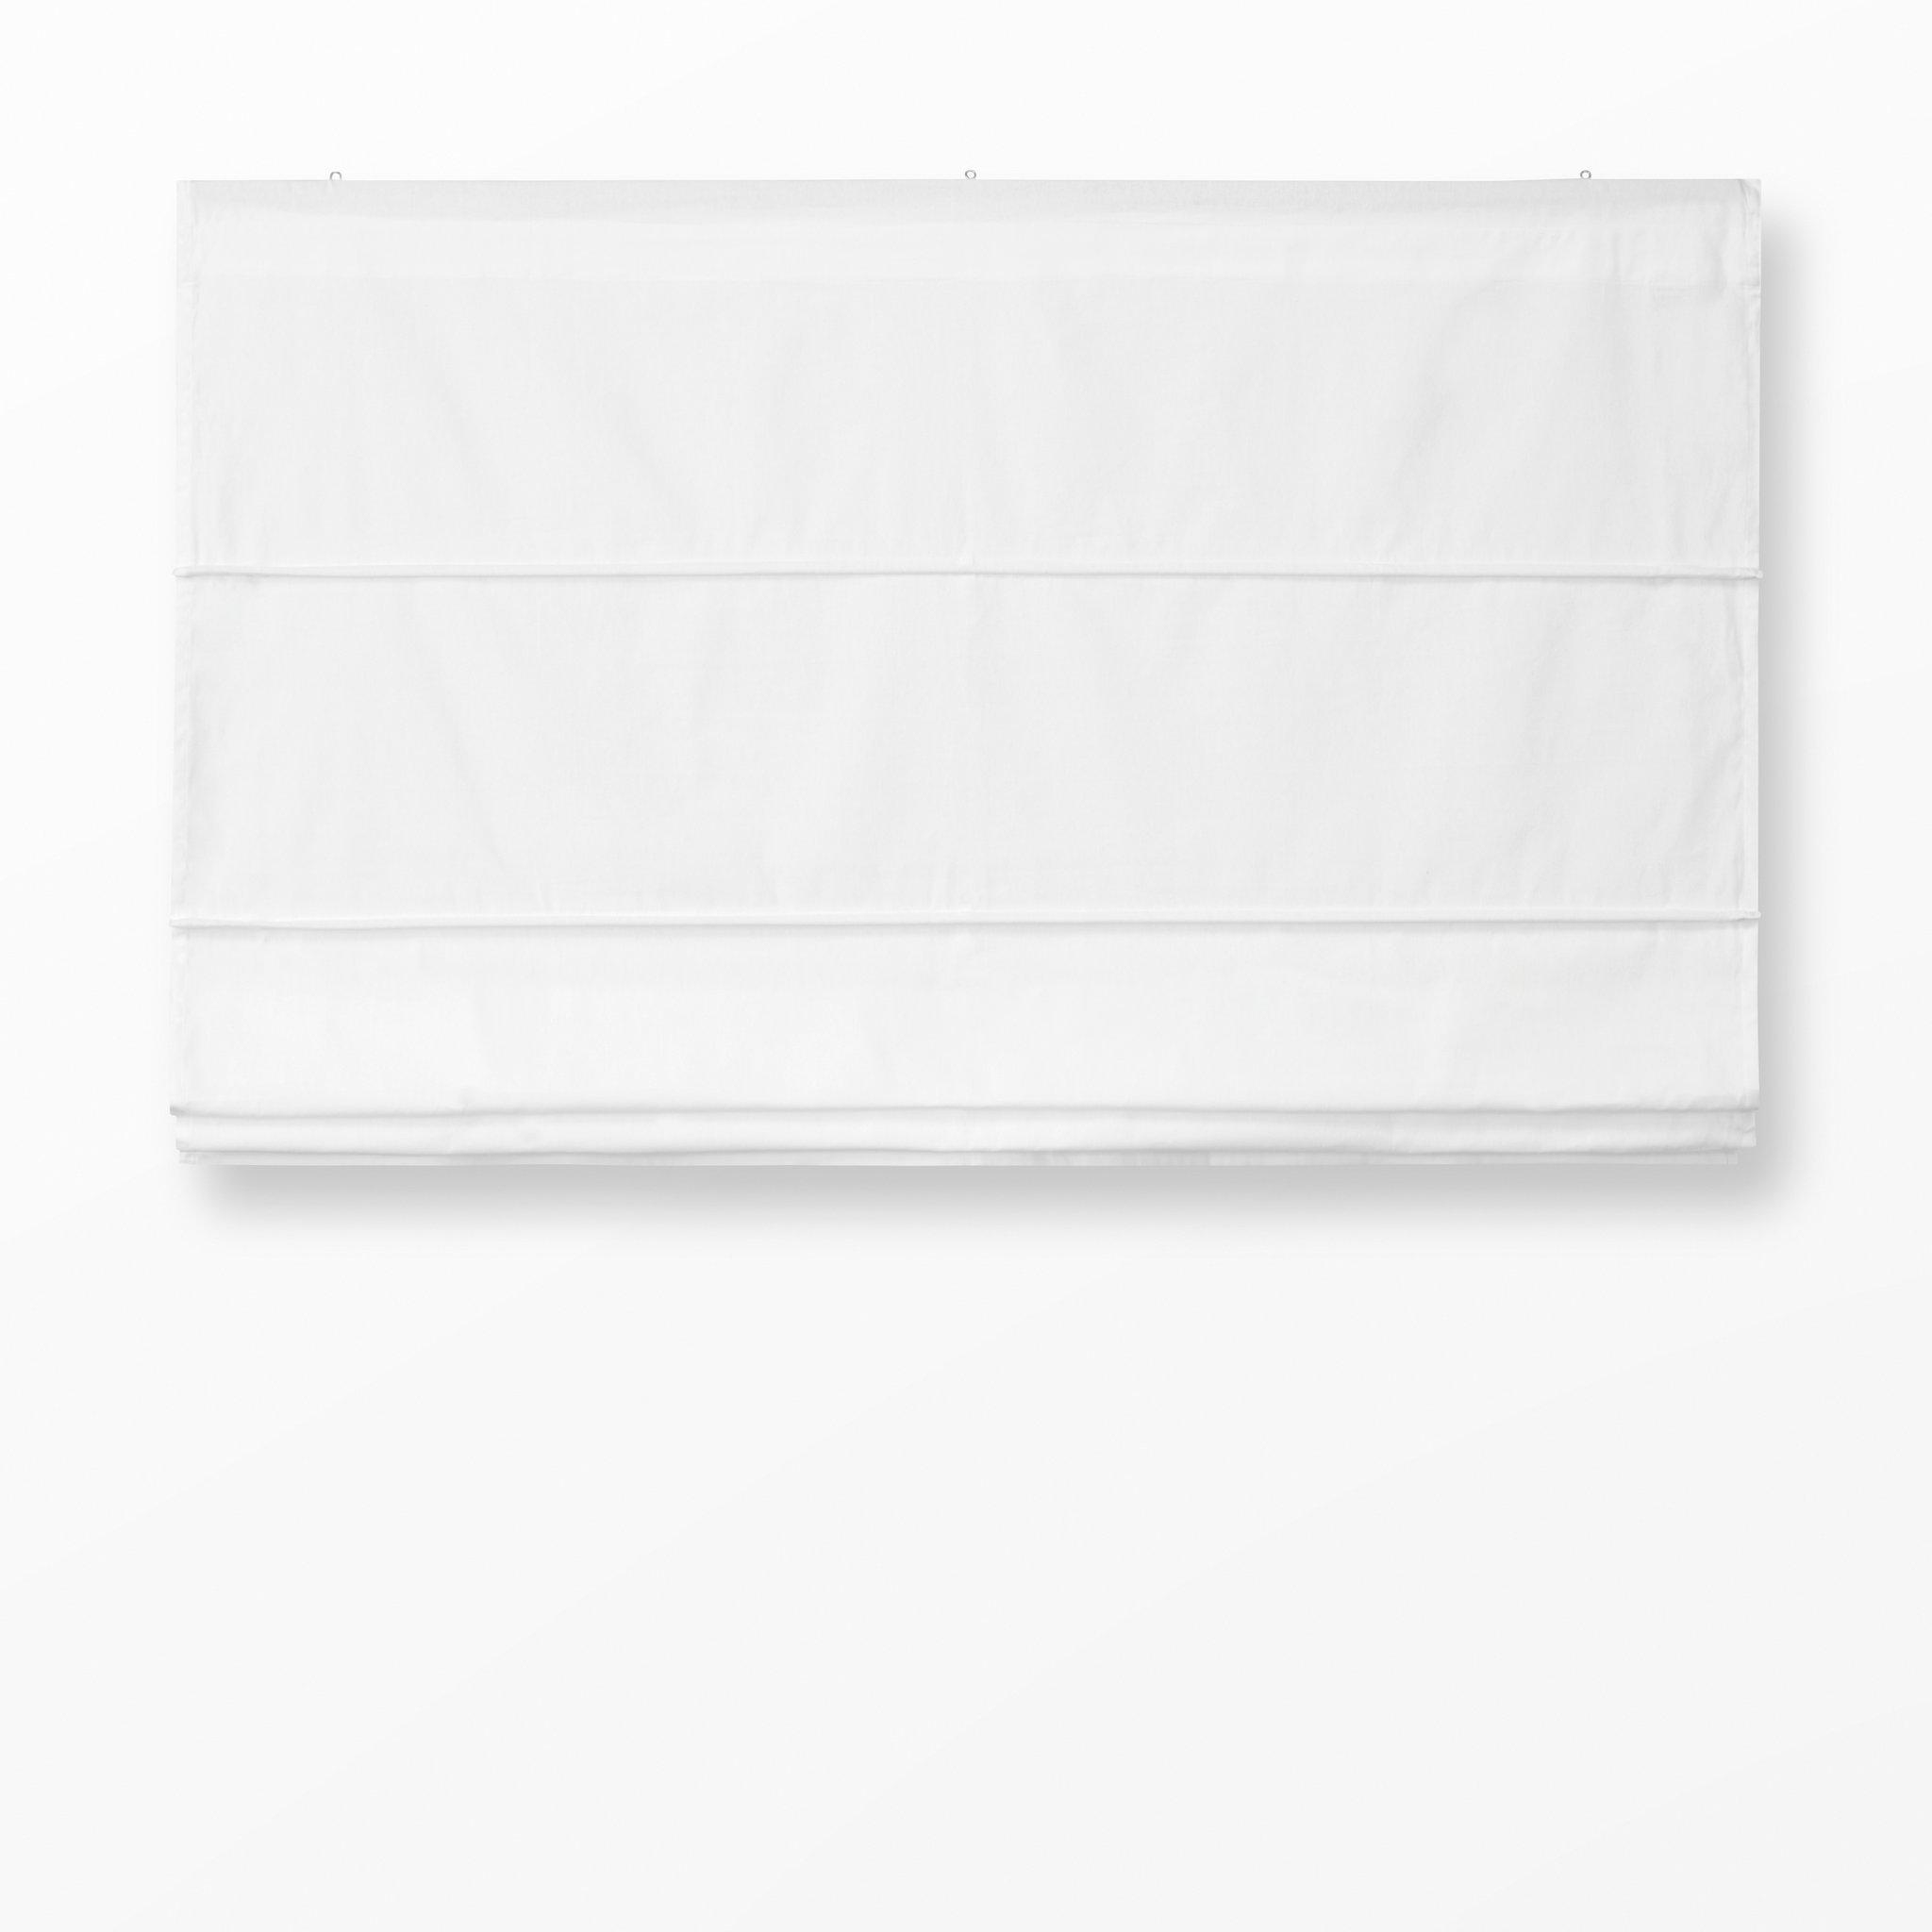 Hissgardin Steg, 140x170 cm